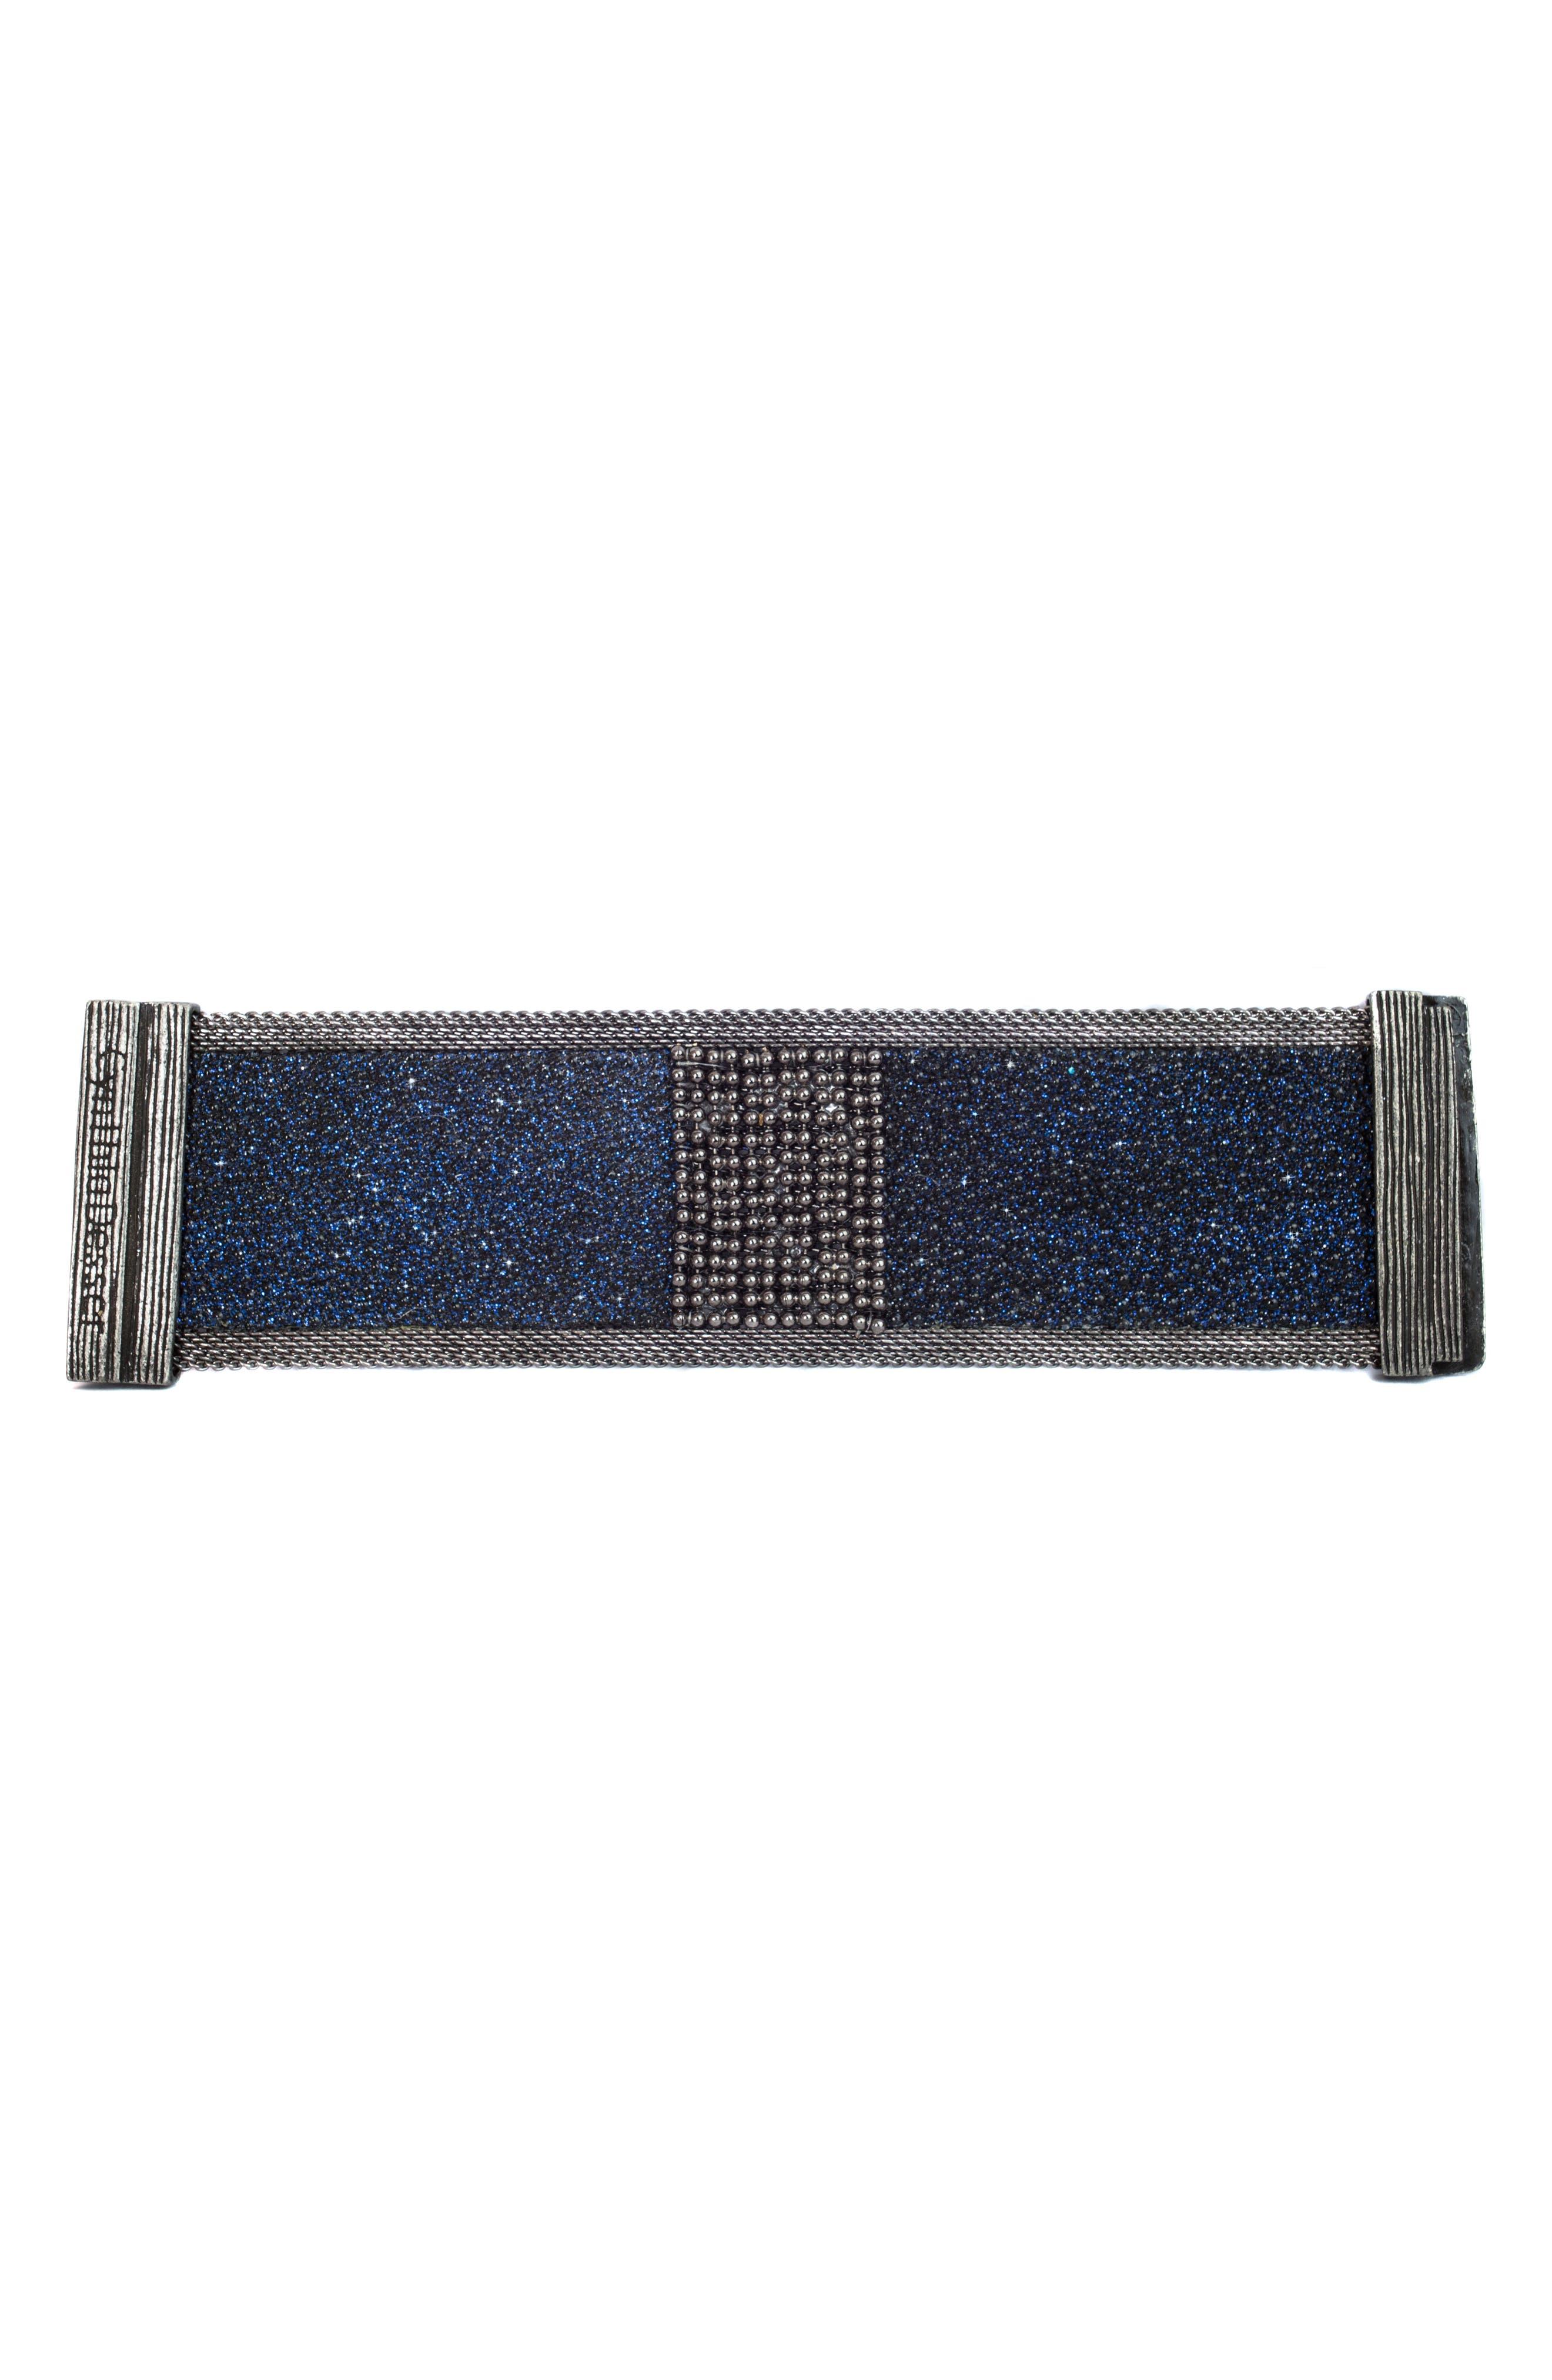 Wide Shimmer Stingray Bracelet,                             Alternate thumbnail 2, color,                             Black/ Cobalt Blue/ Gun Metal